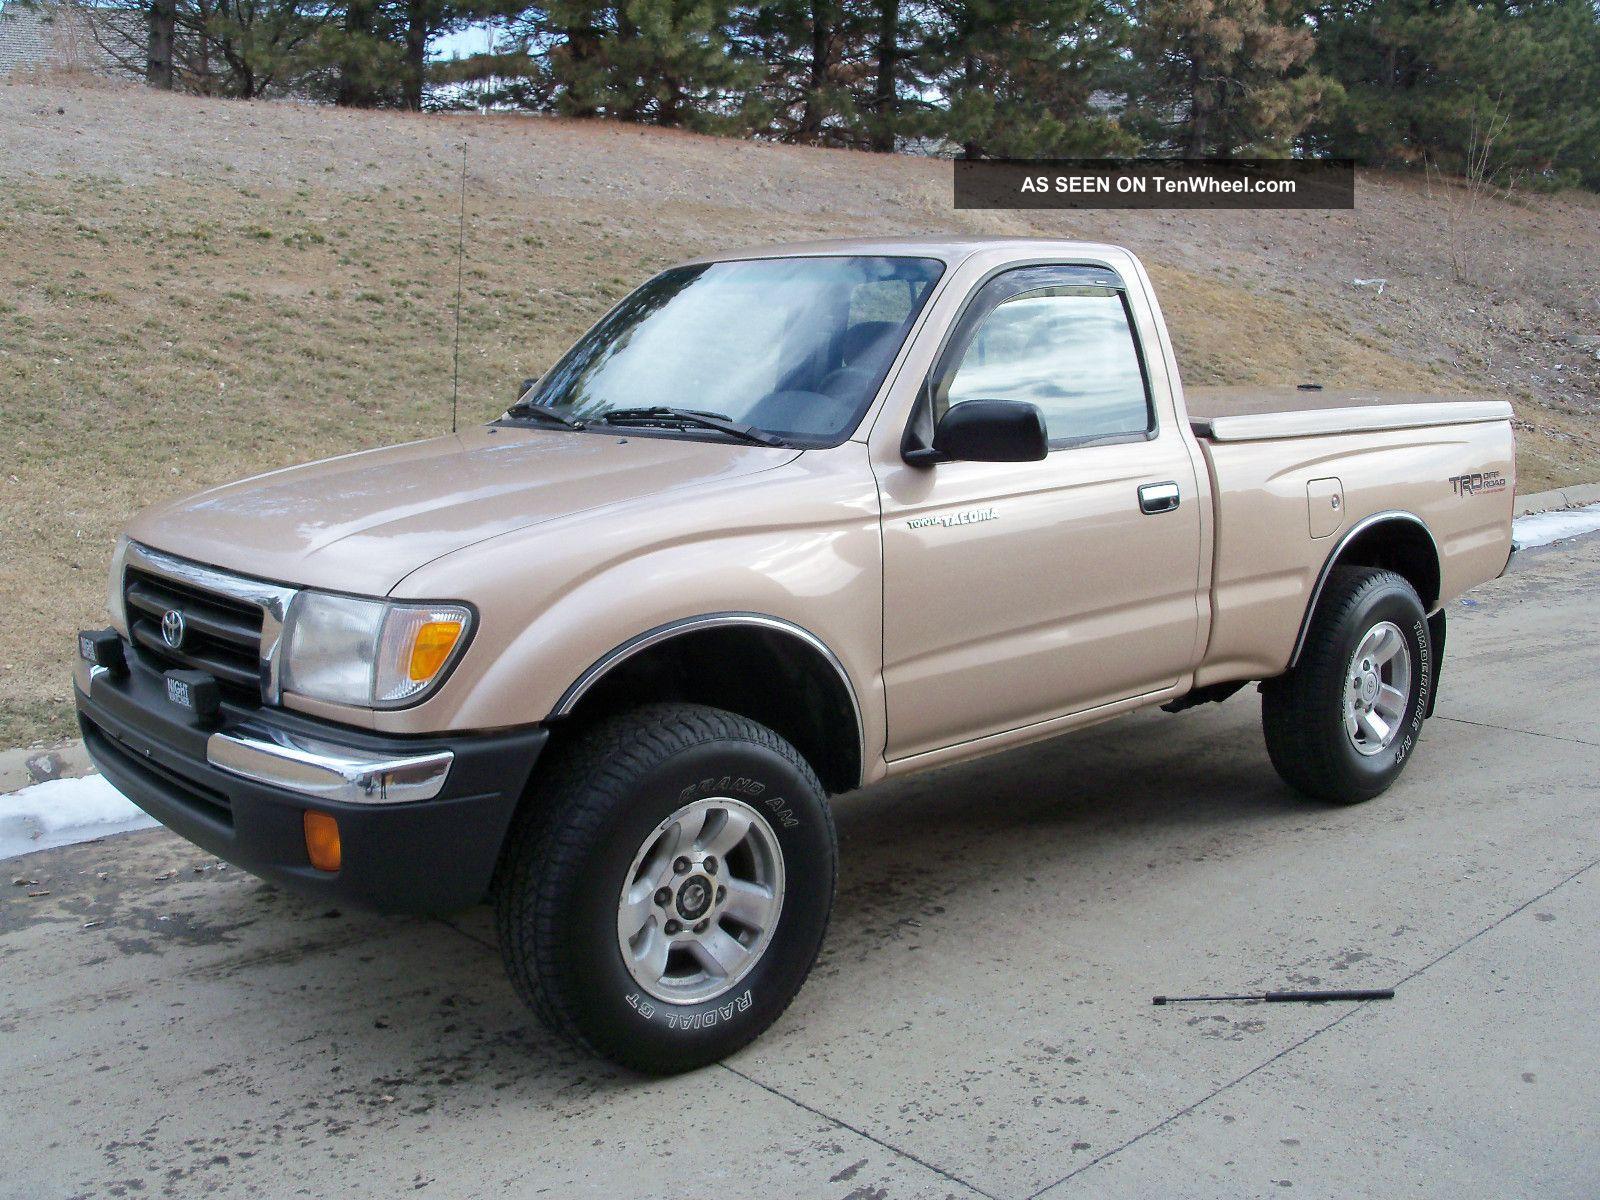 1999 Toyota Tacoma Image 12